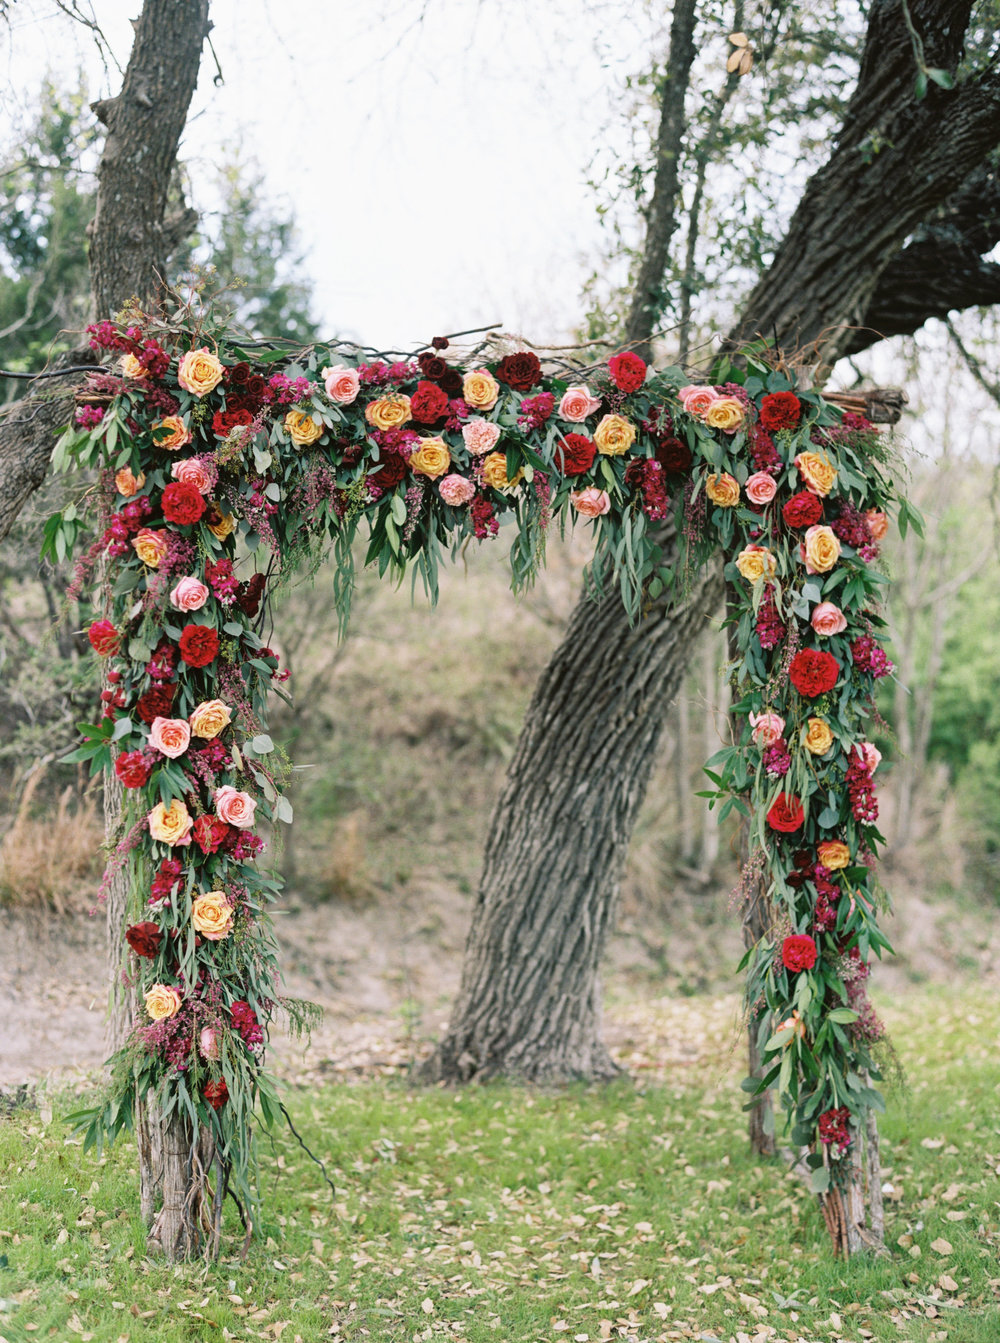 The-Creek-Haus-Wedding-Dripping-Springs-57.jpg